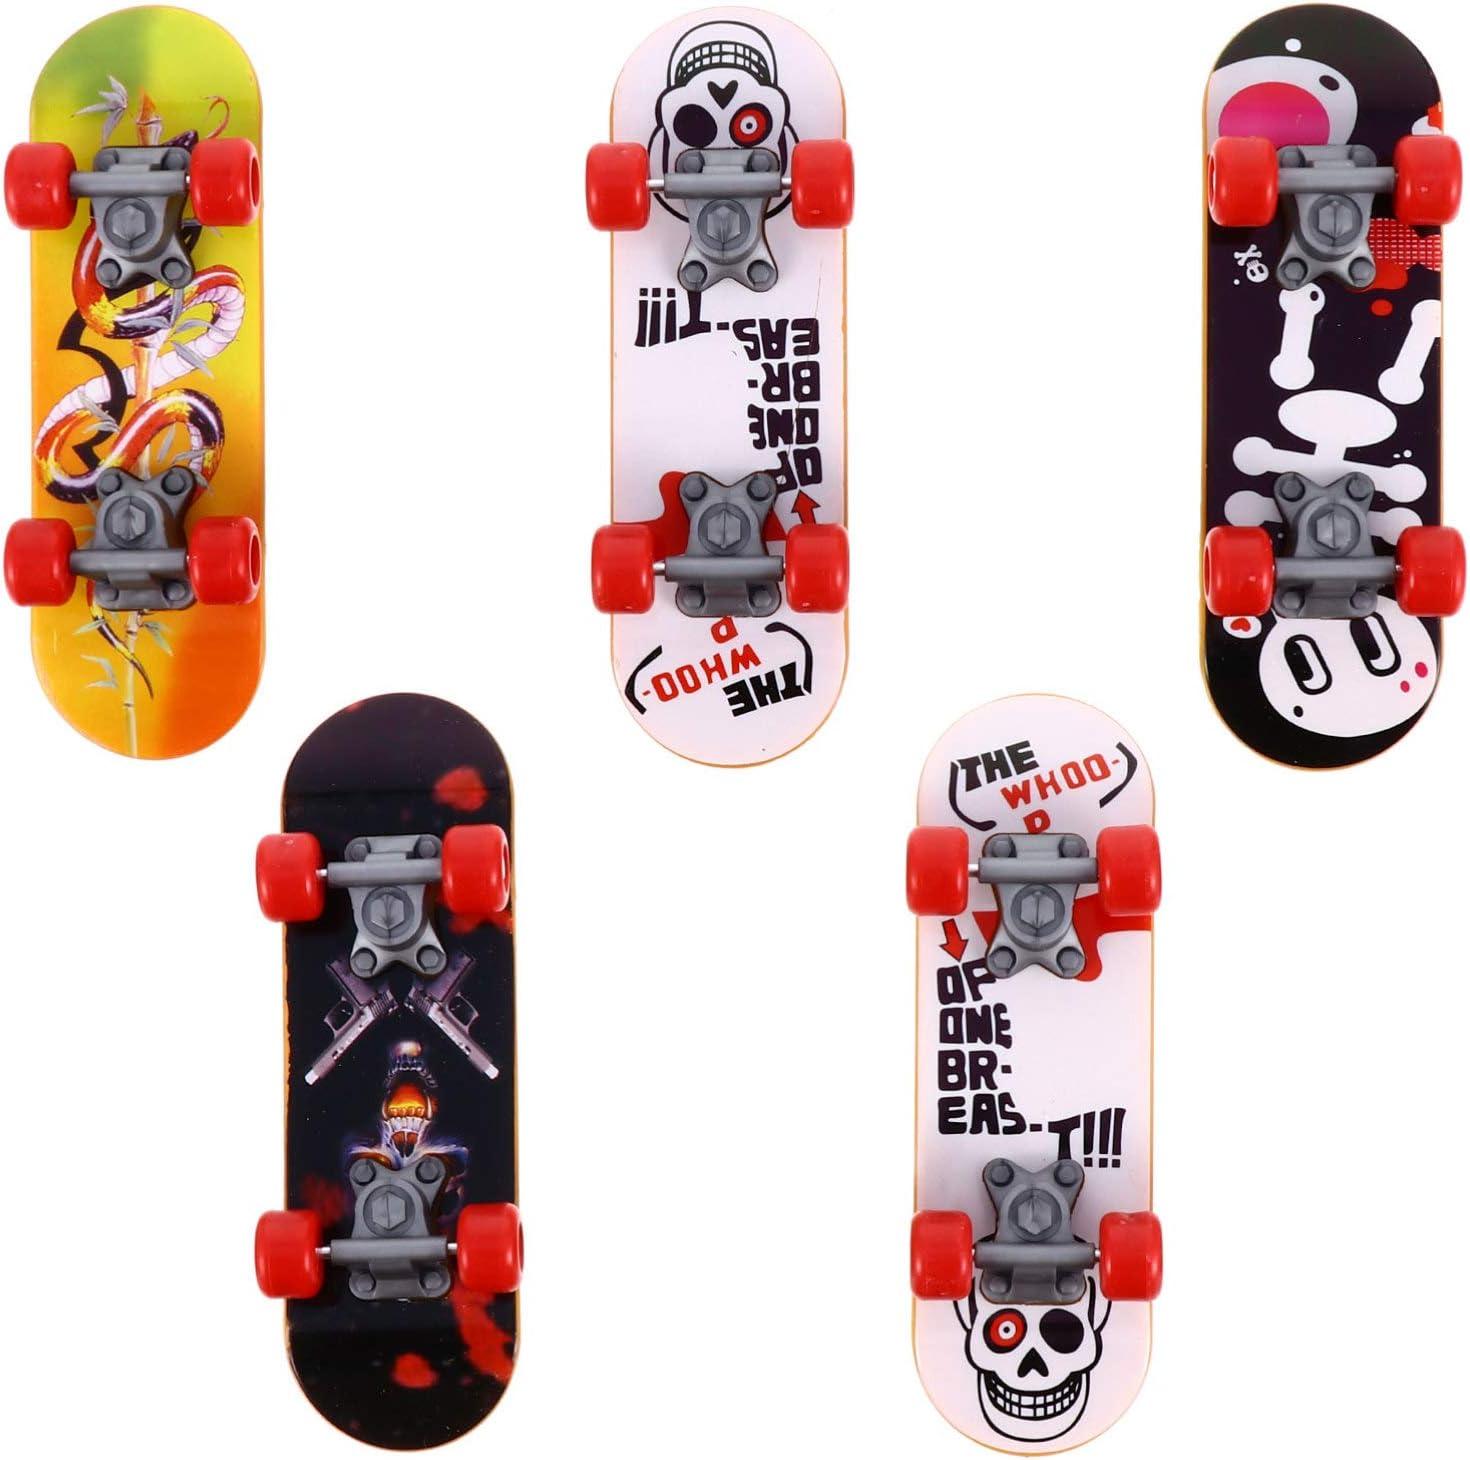 TOYANDONA 5pcs Finger Skateboards Mini Toy Free shipping New mart Fingerboards Fin